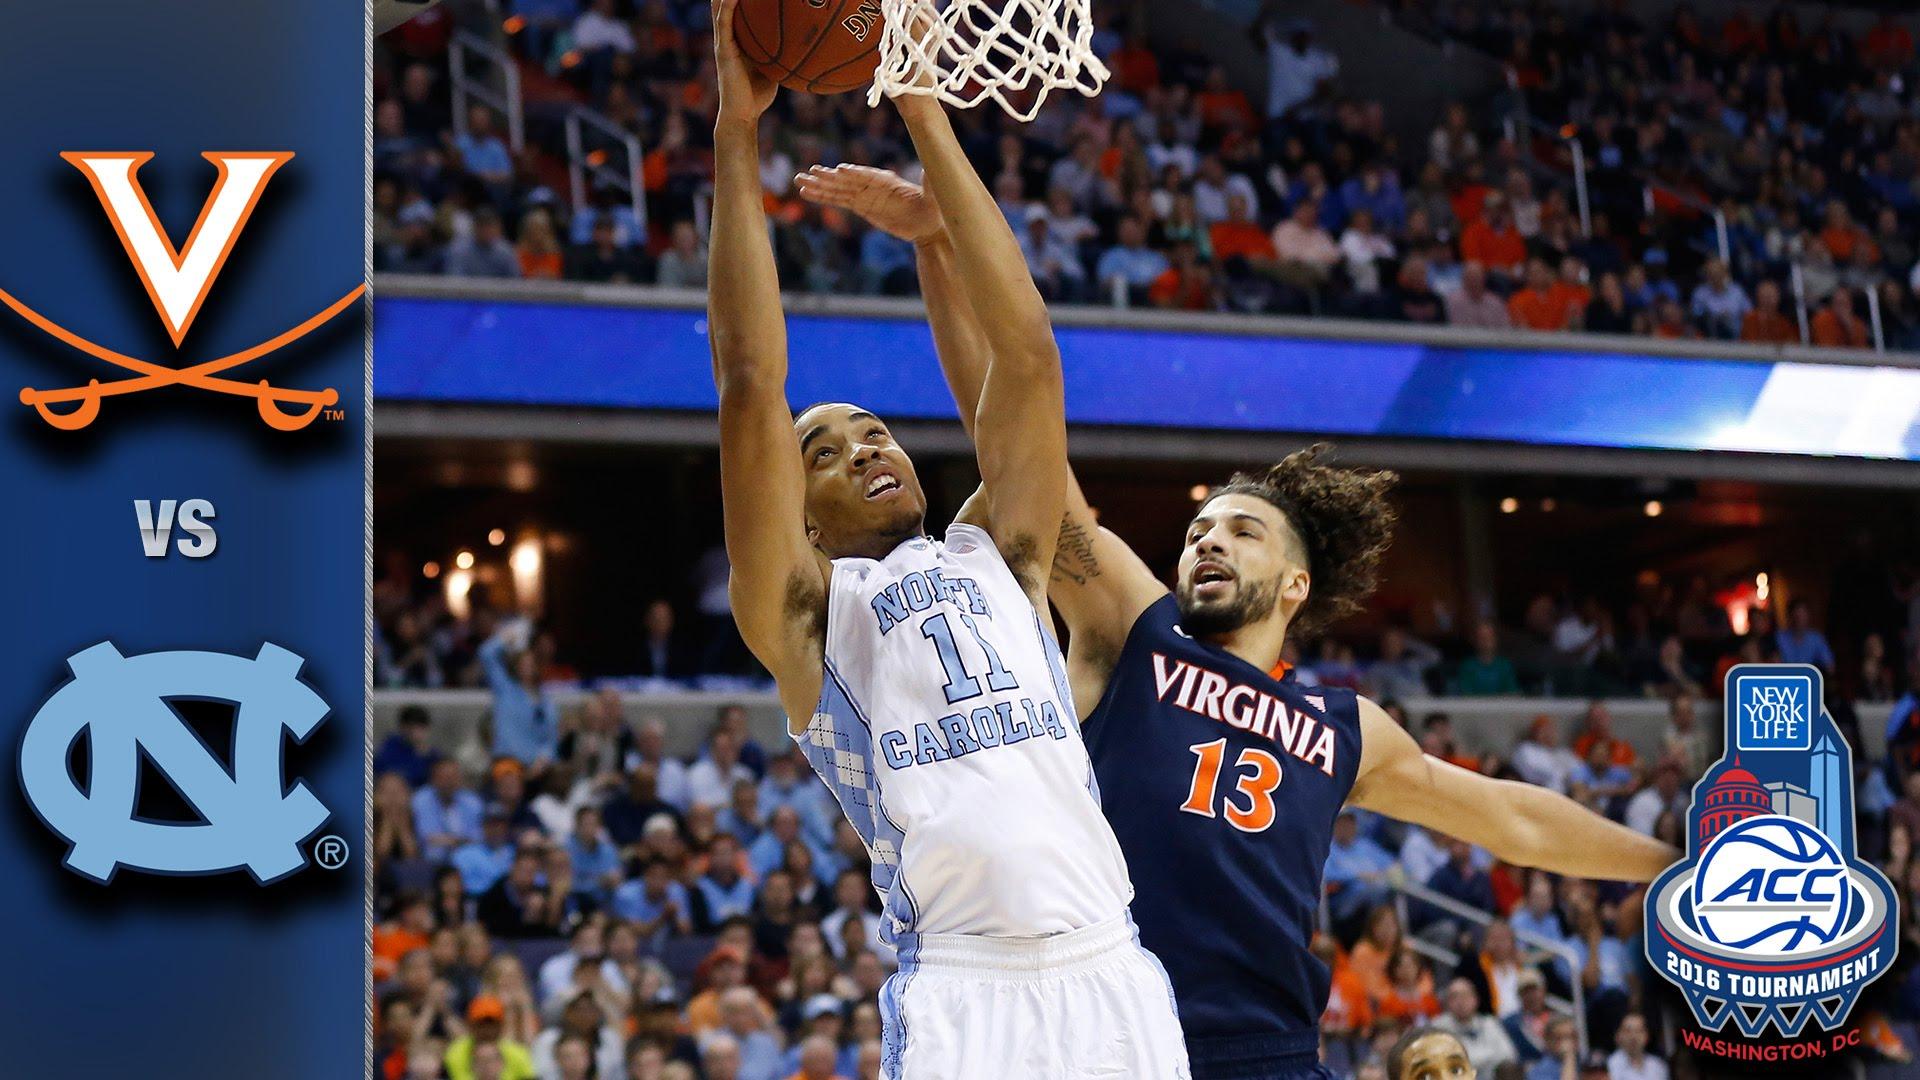 Virginia vs. North Carolina 2016 ACC Basketball Championship Game ...